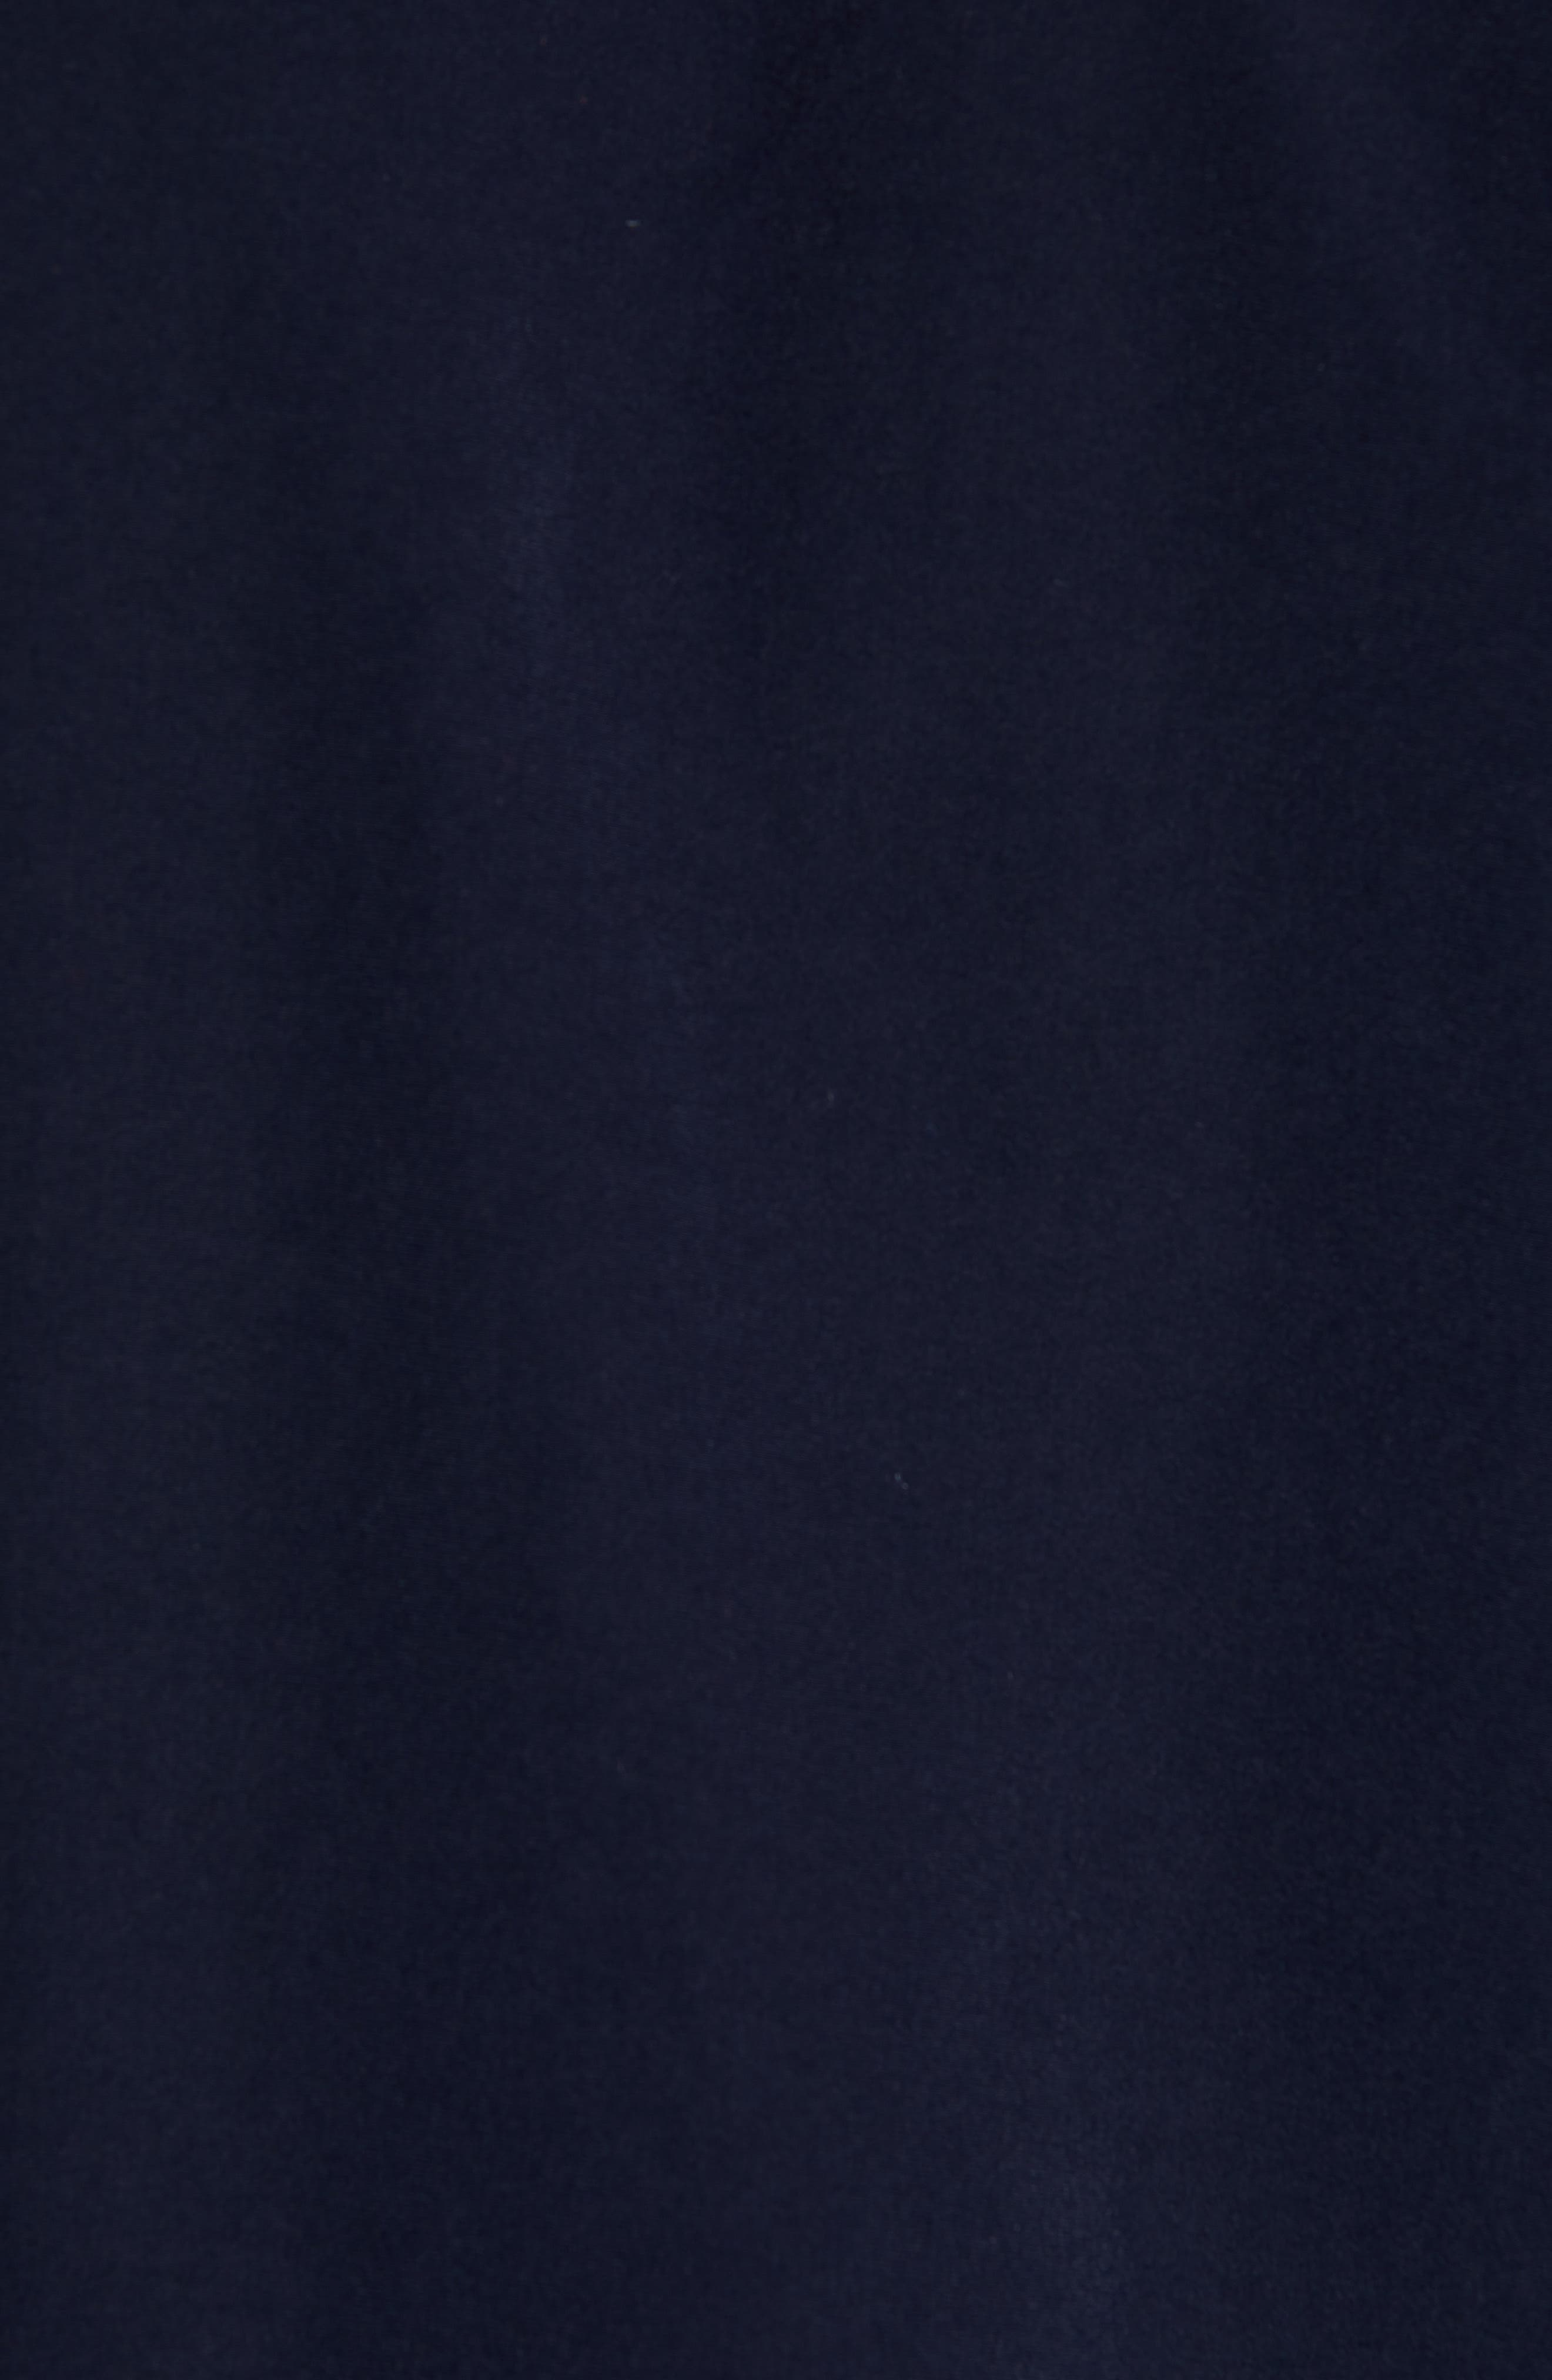 TED BAKER LONDON, Aroma Slim Fit Bomber Jacket, Alternate thumbnail 7, color, NAVY